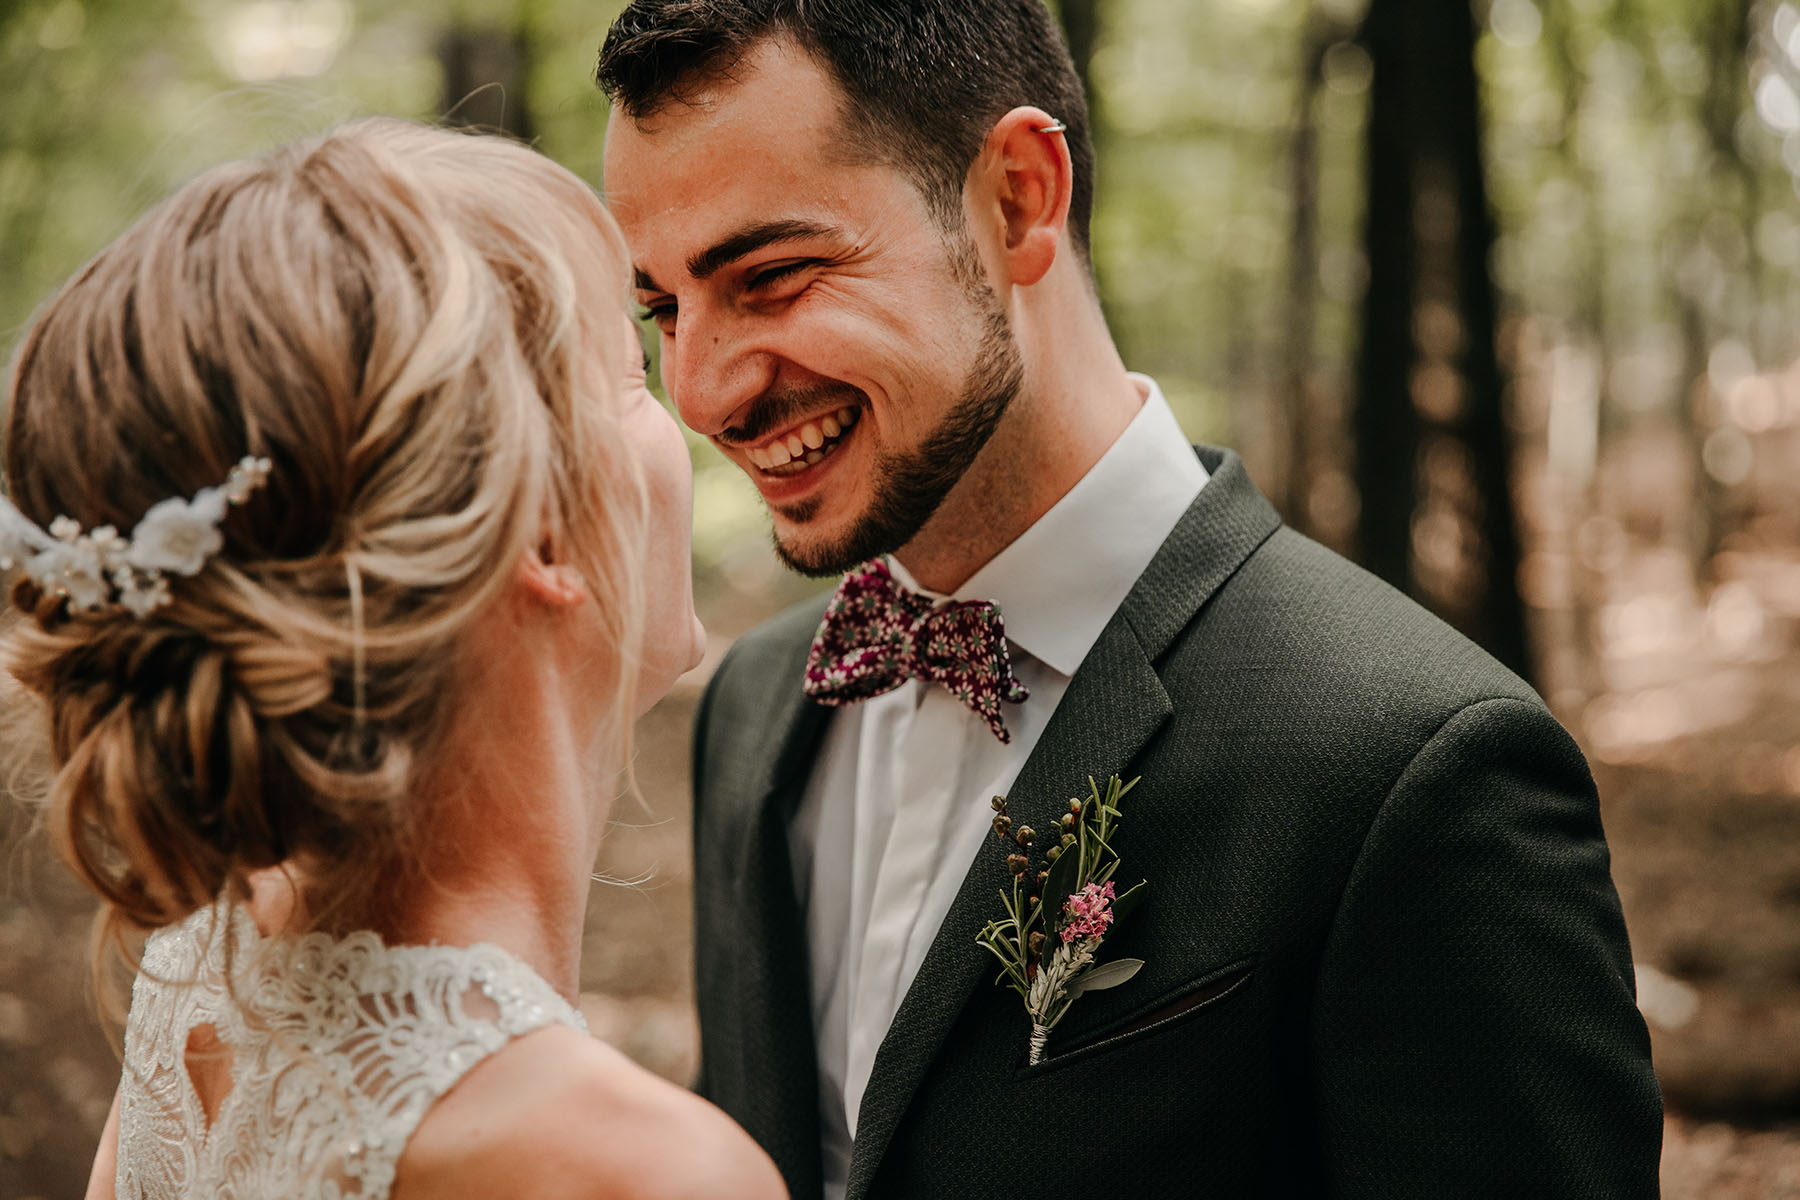 Bräutigam mit Fliege und grünem Anzug